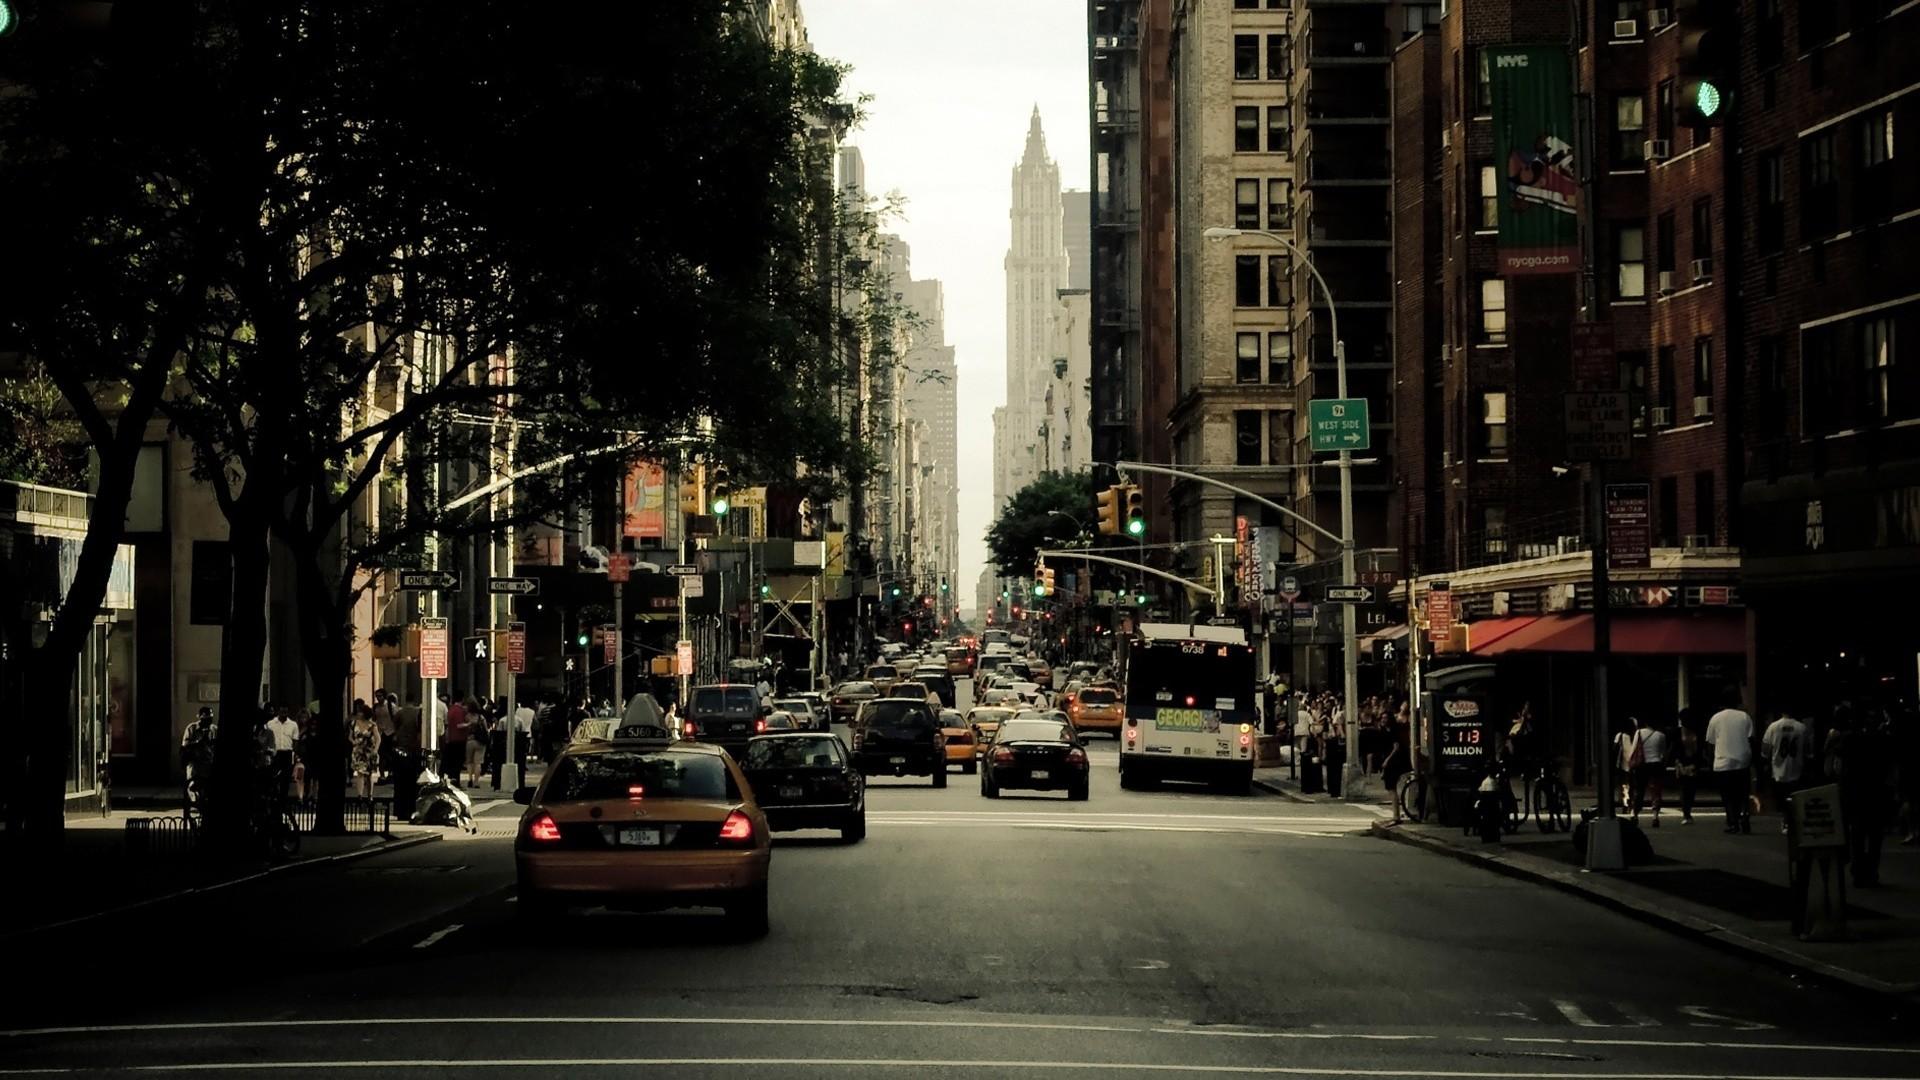 New-York-City-Street-HD-Desktop-Background-Wallpaper